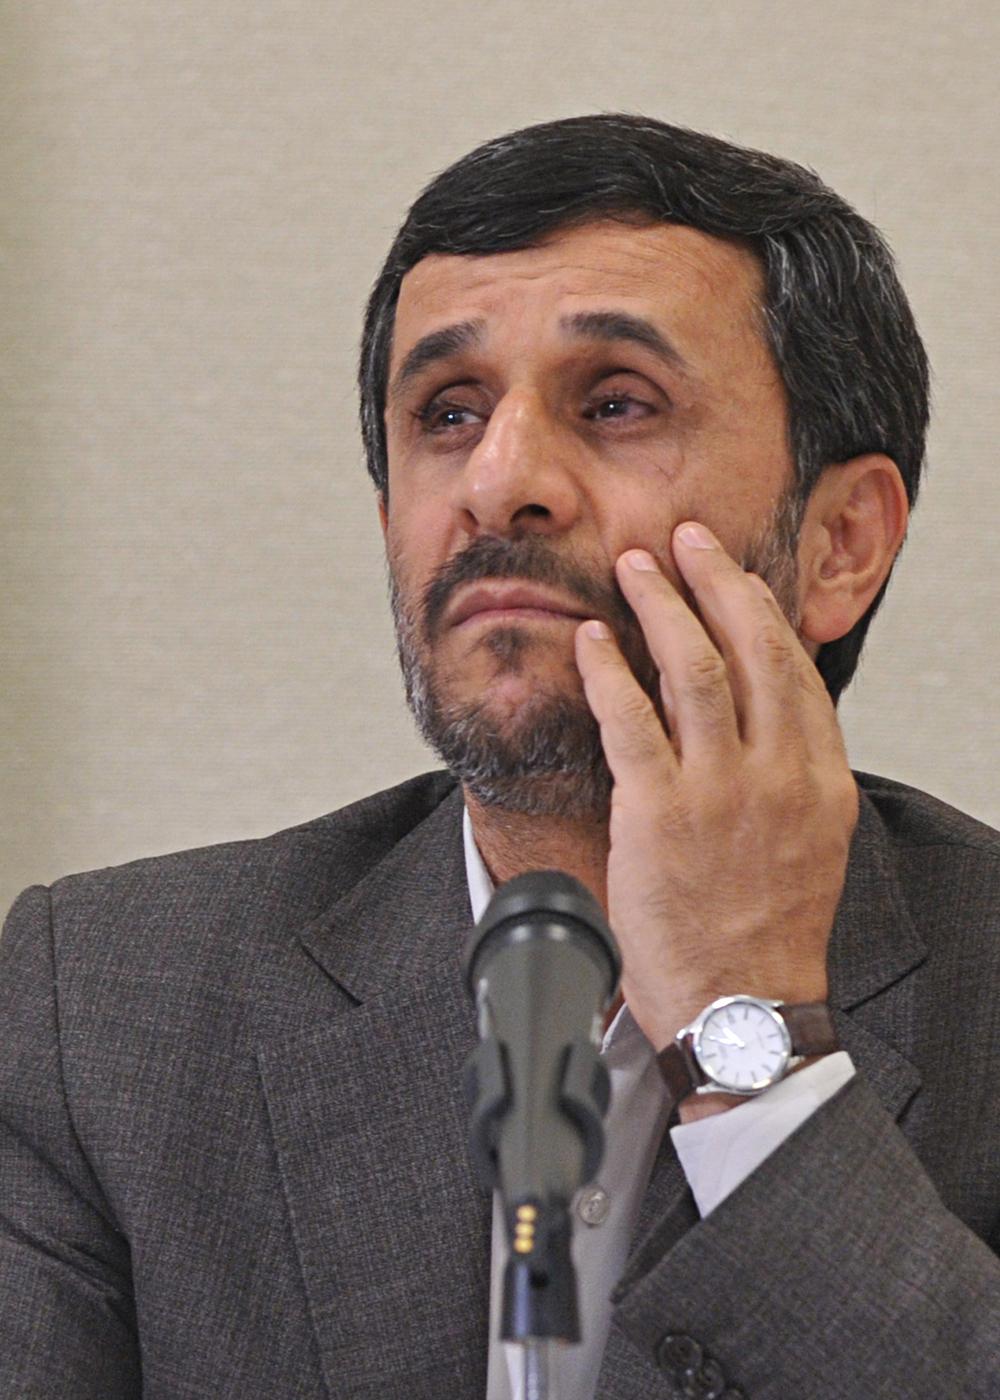 Mahmoud Ahmadinejad. Credit: Wikimedia Commons.